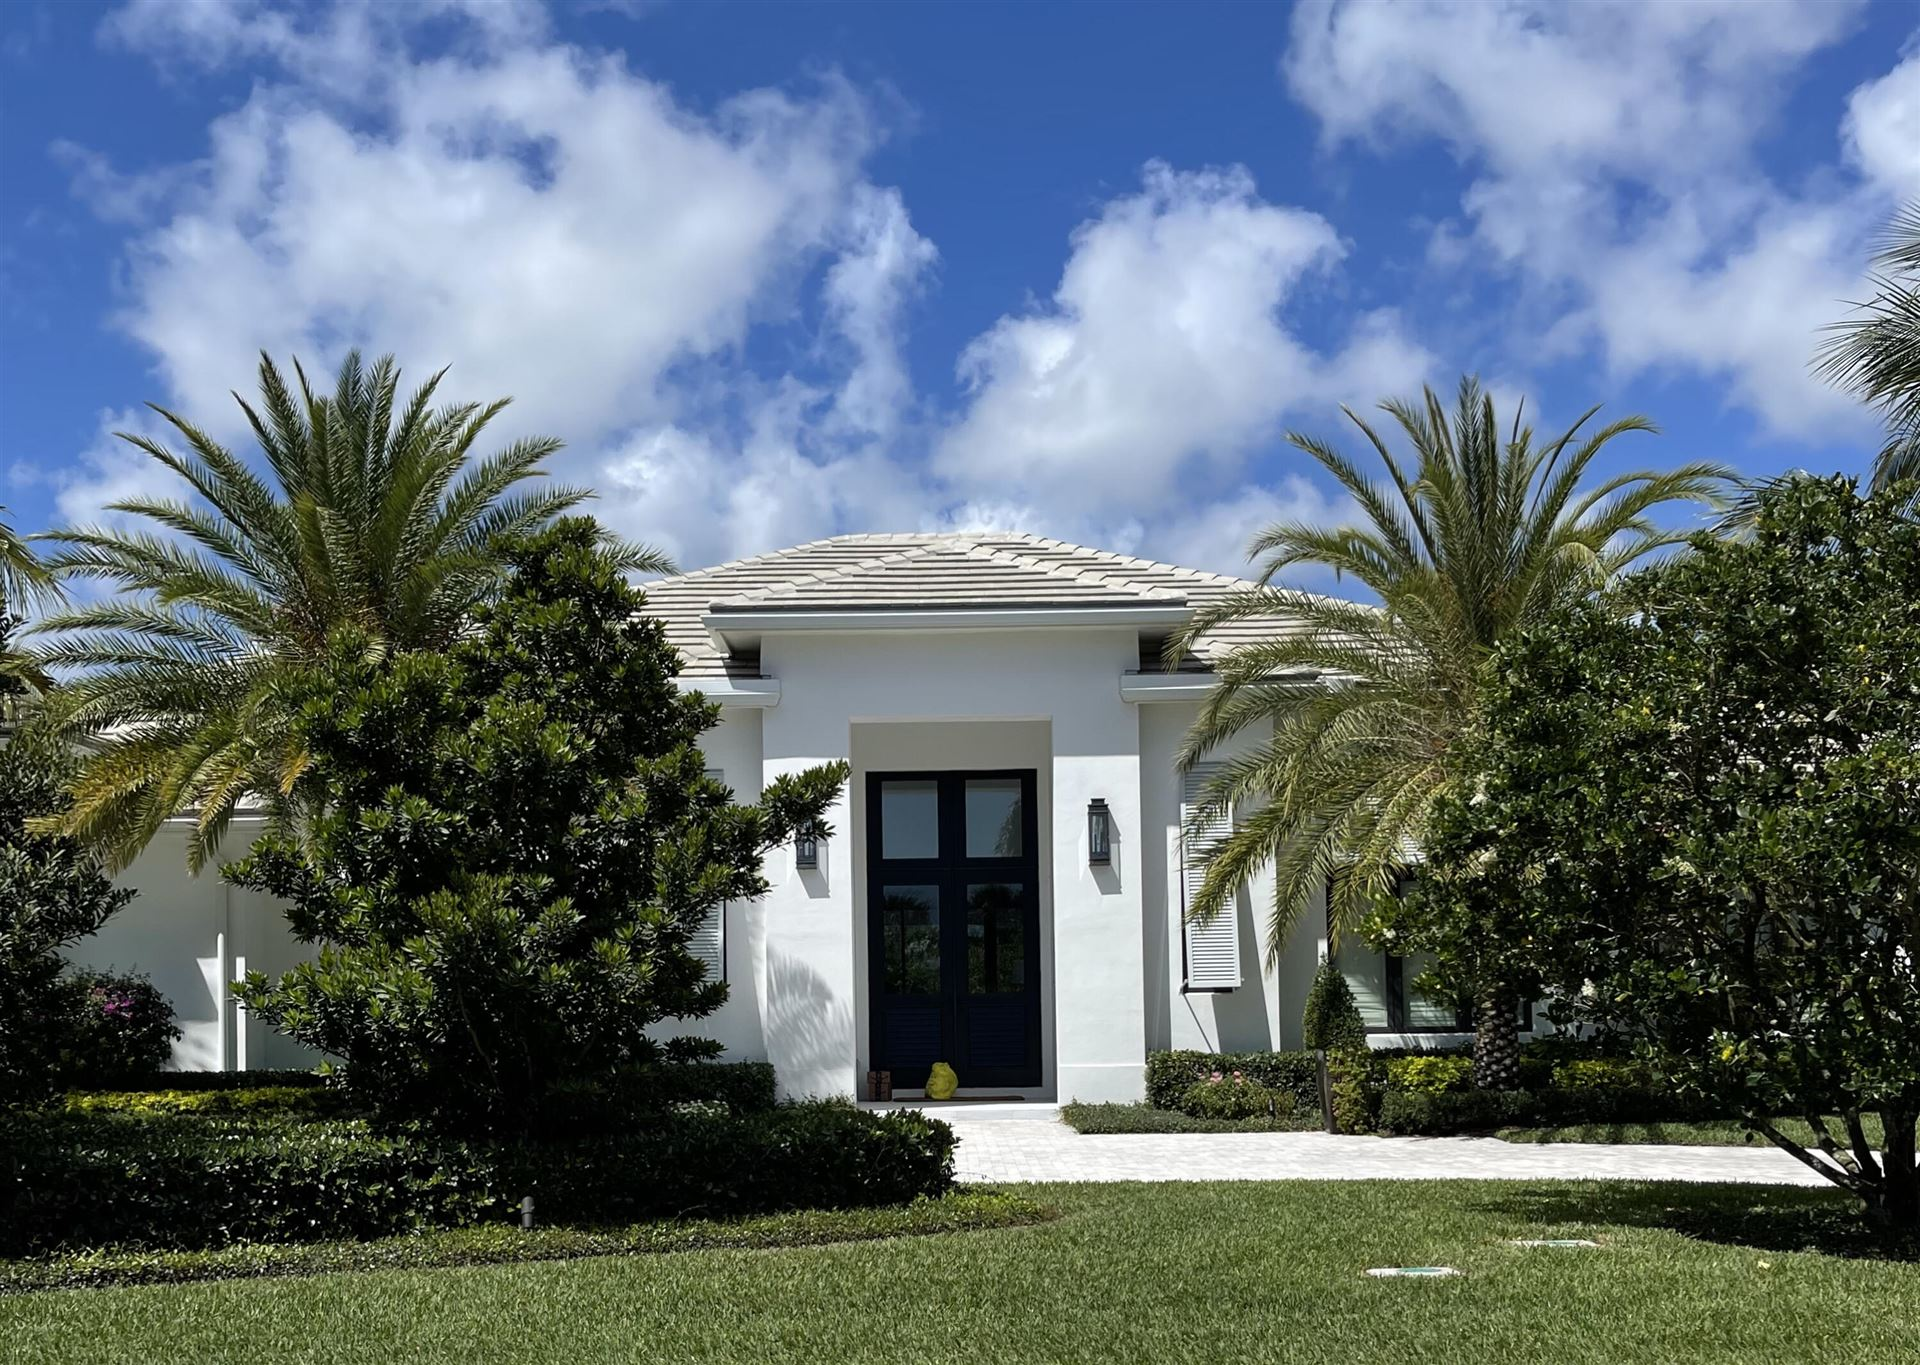 Photo of 110 Golf Village Boulevard, Jupiter, FL 33458 (MLS # RX-10703841)